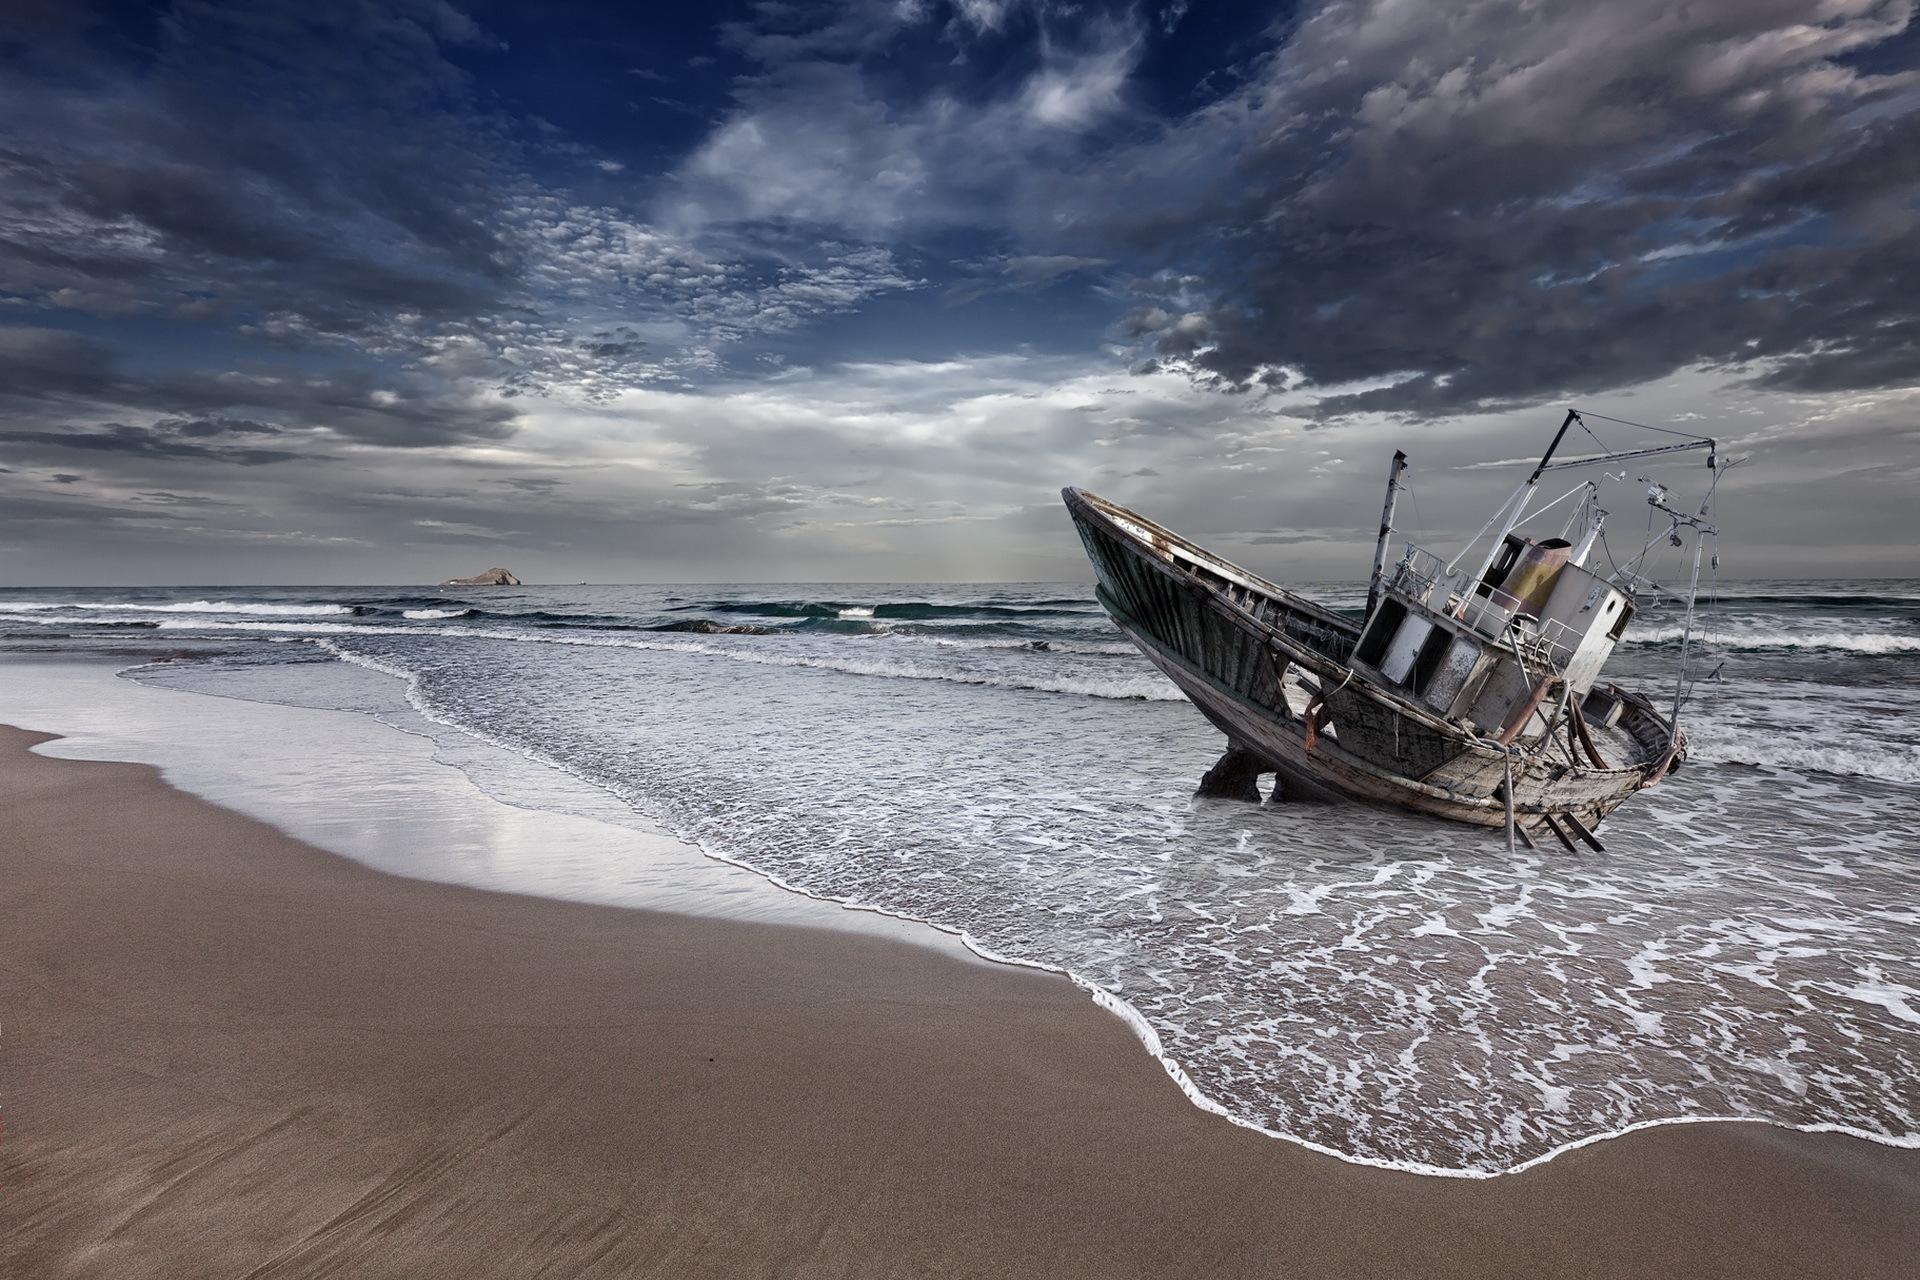 Point Reyes корабль на берегу бесплатно